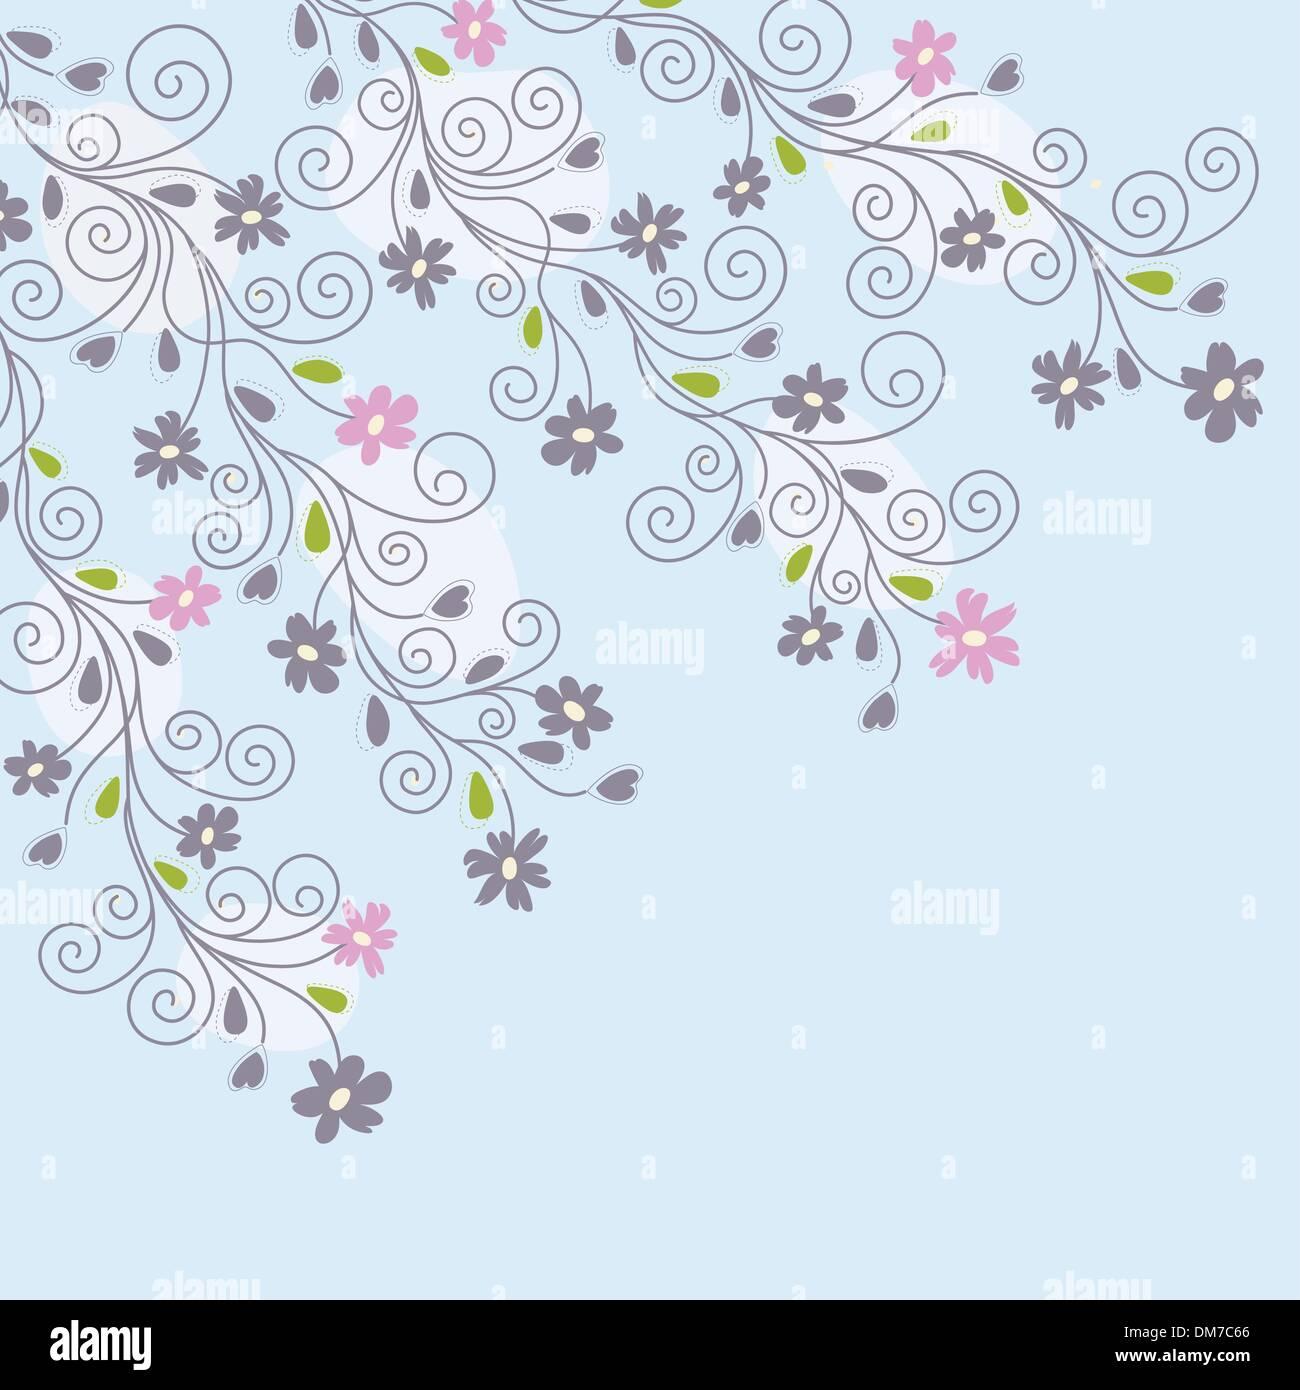 Cute Light Blue Floral Background Stock Vector Art Illustration